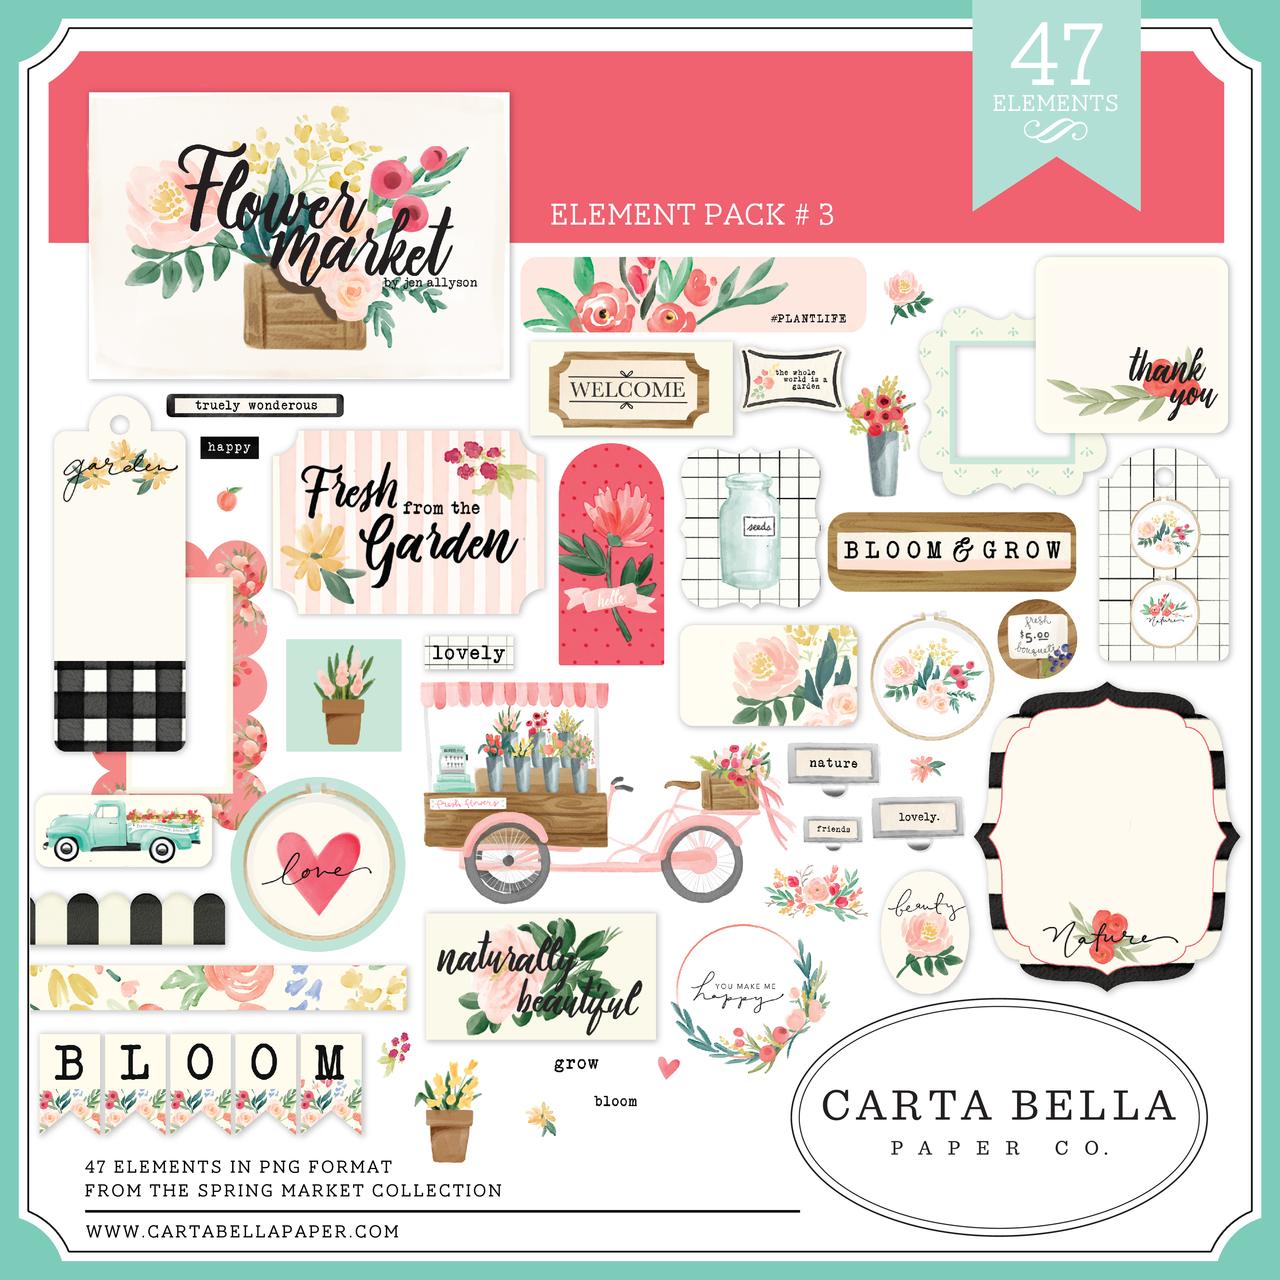 Flower Market Element Pack #3